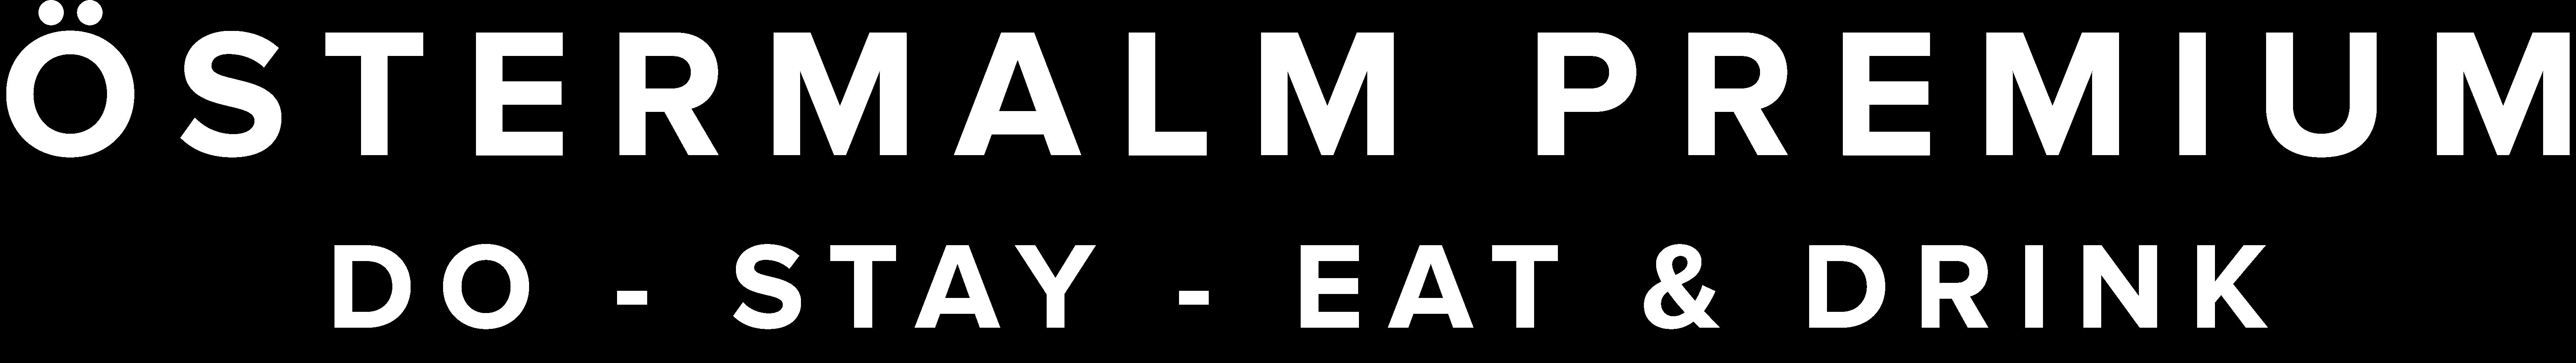 Logo Östermalm Premium - Do - Stay - Eat & Drink - @ostermalm #östermalm - ostermalm.com